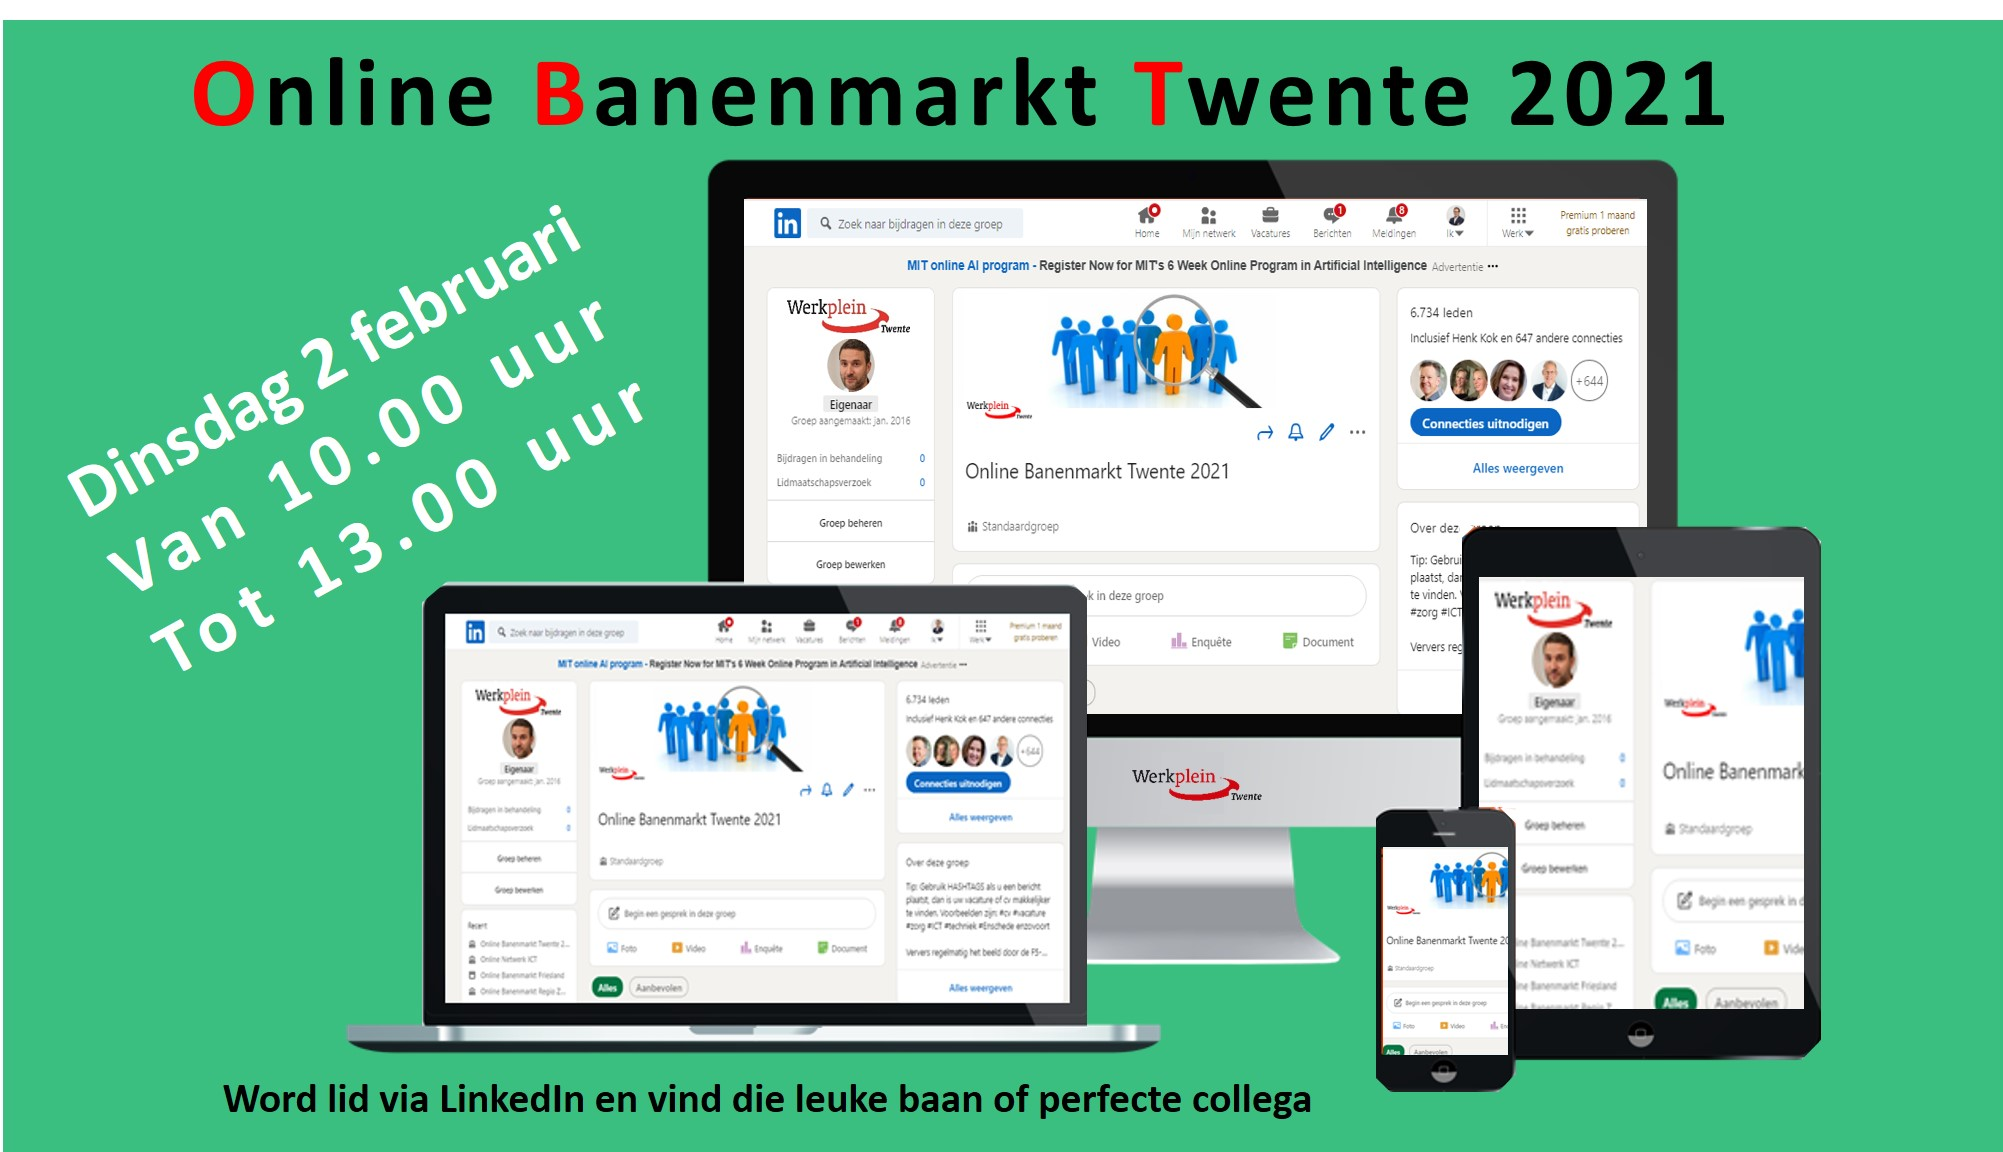 Online Banenmarkt 2021 februari